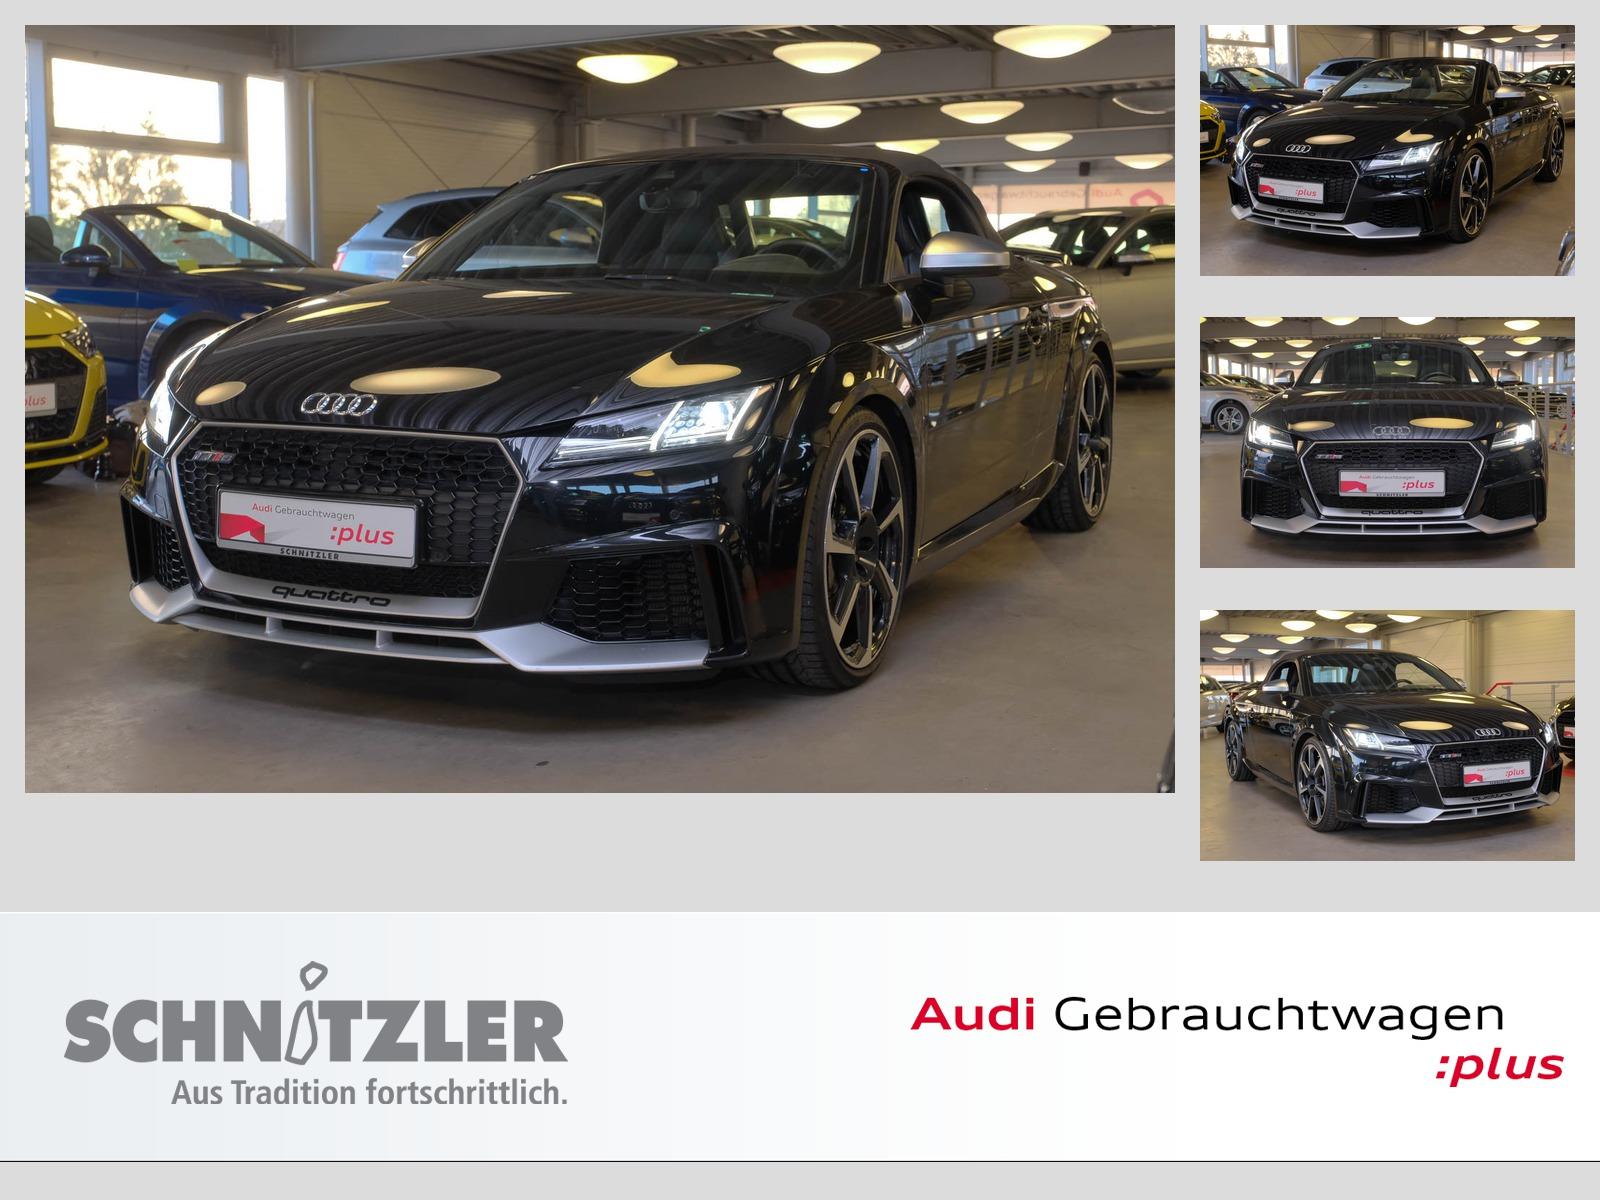 Audi TT RS Roadster 2.5 TFSI quattro S tronic LED/Navi/LEDER/+++, Jahr 2016, petrol